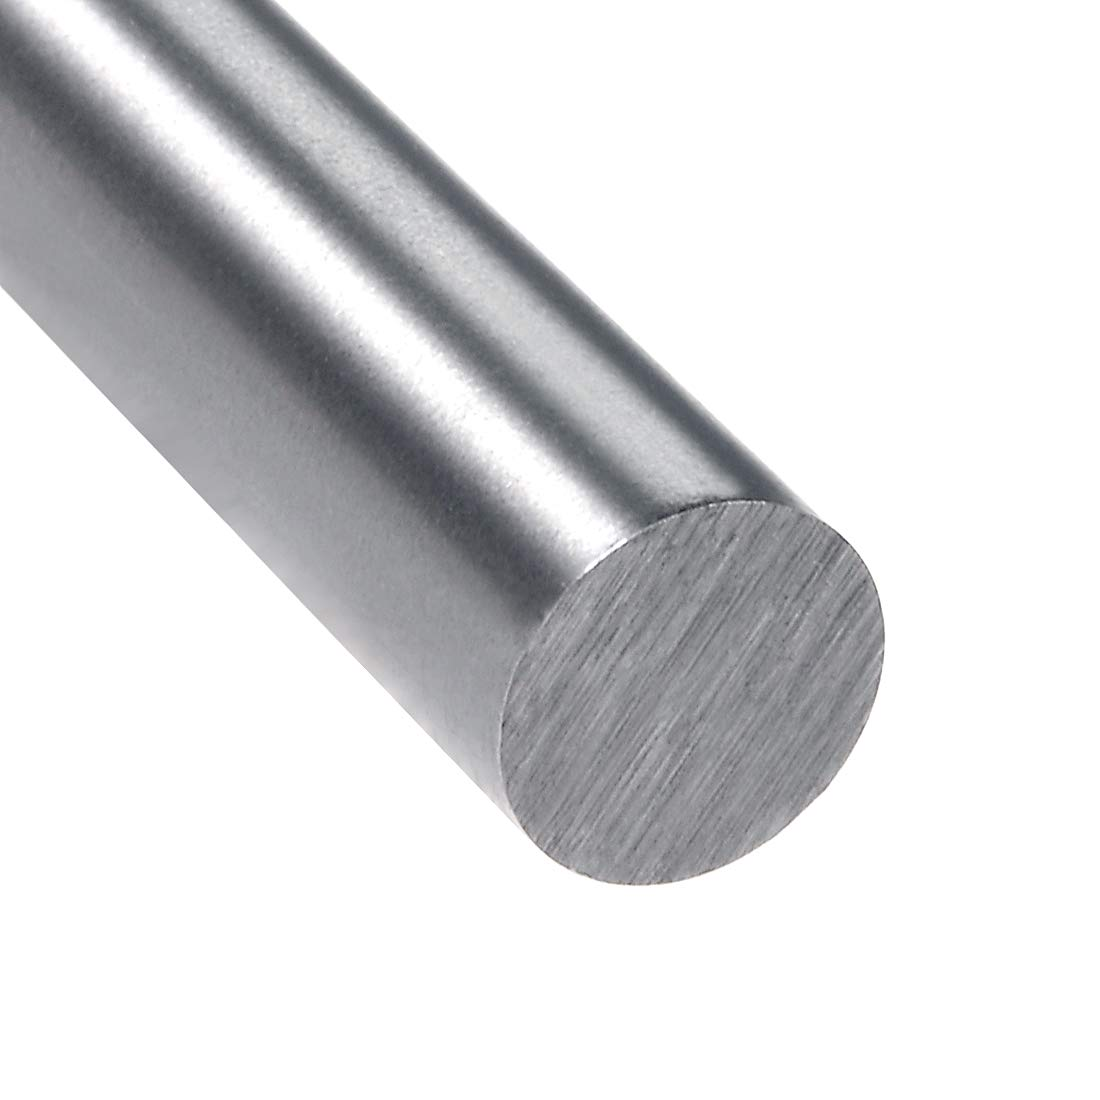 sourcing map HSS Lathe Round Rod Solid Shaft Bar 8mm Dia 200mm Length 2Pcs